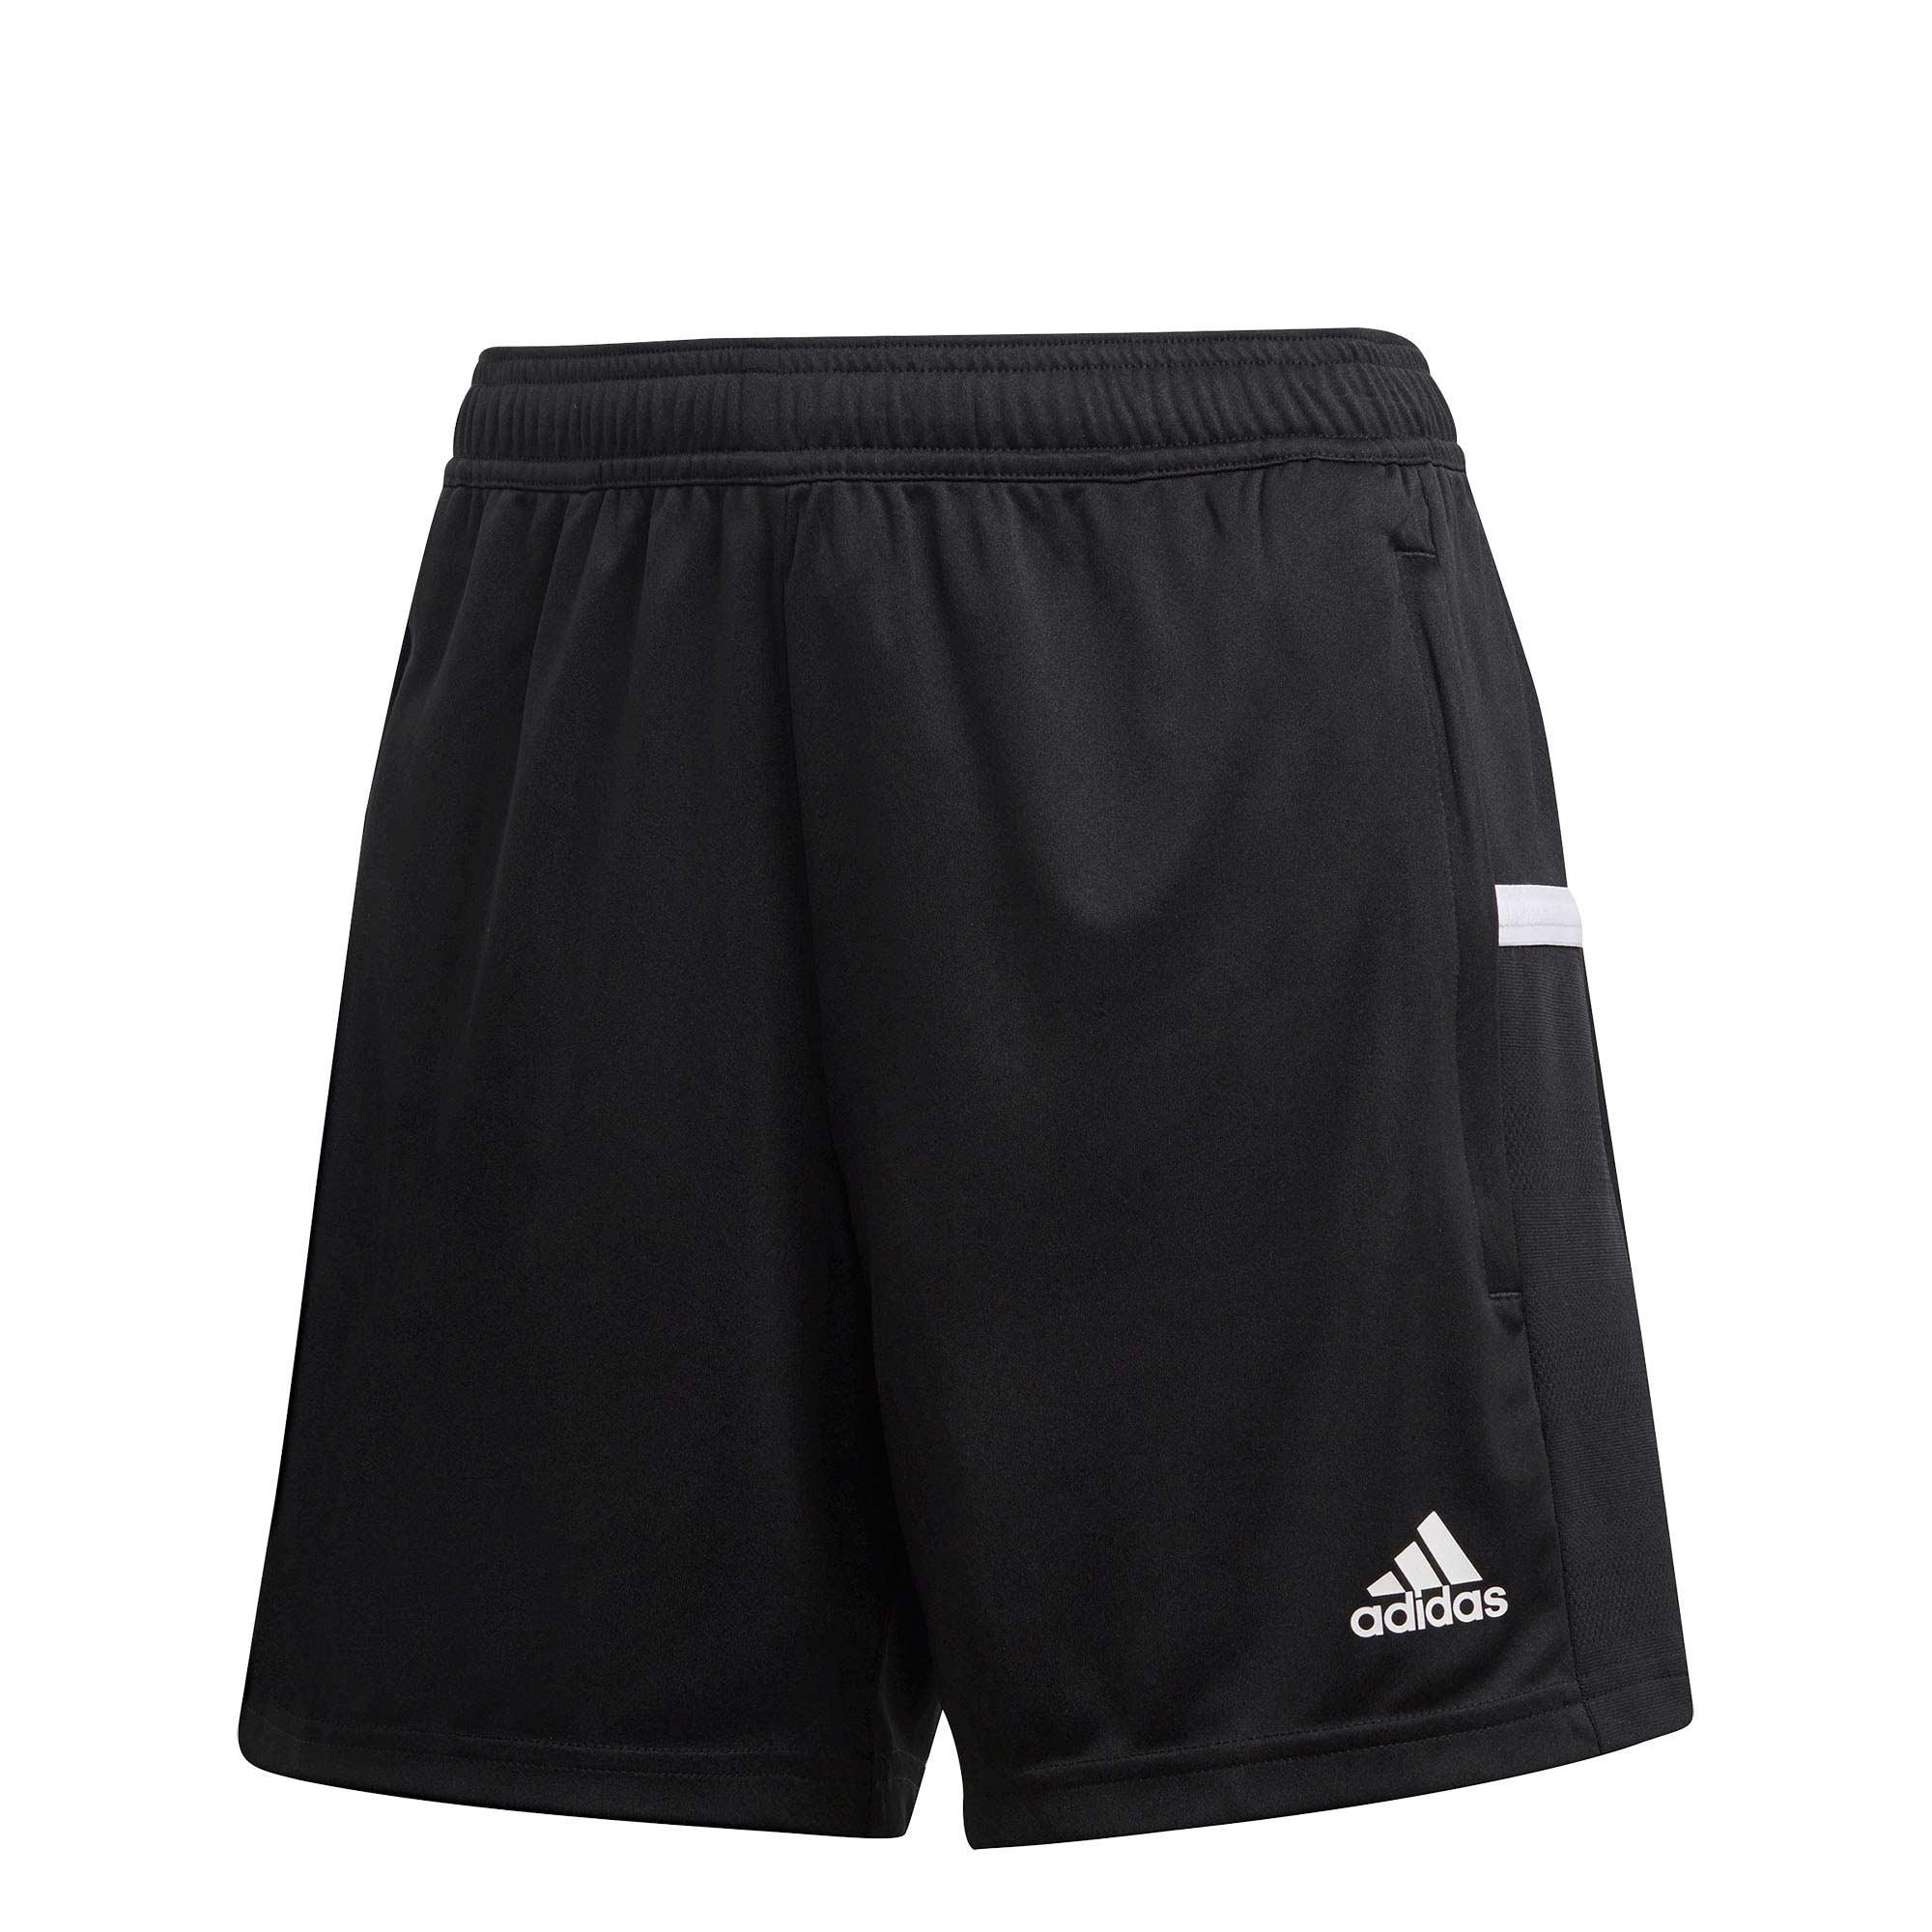 adidas T19 3P Shorts Damen schwarzweiß, DW6879